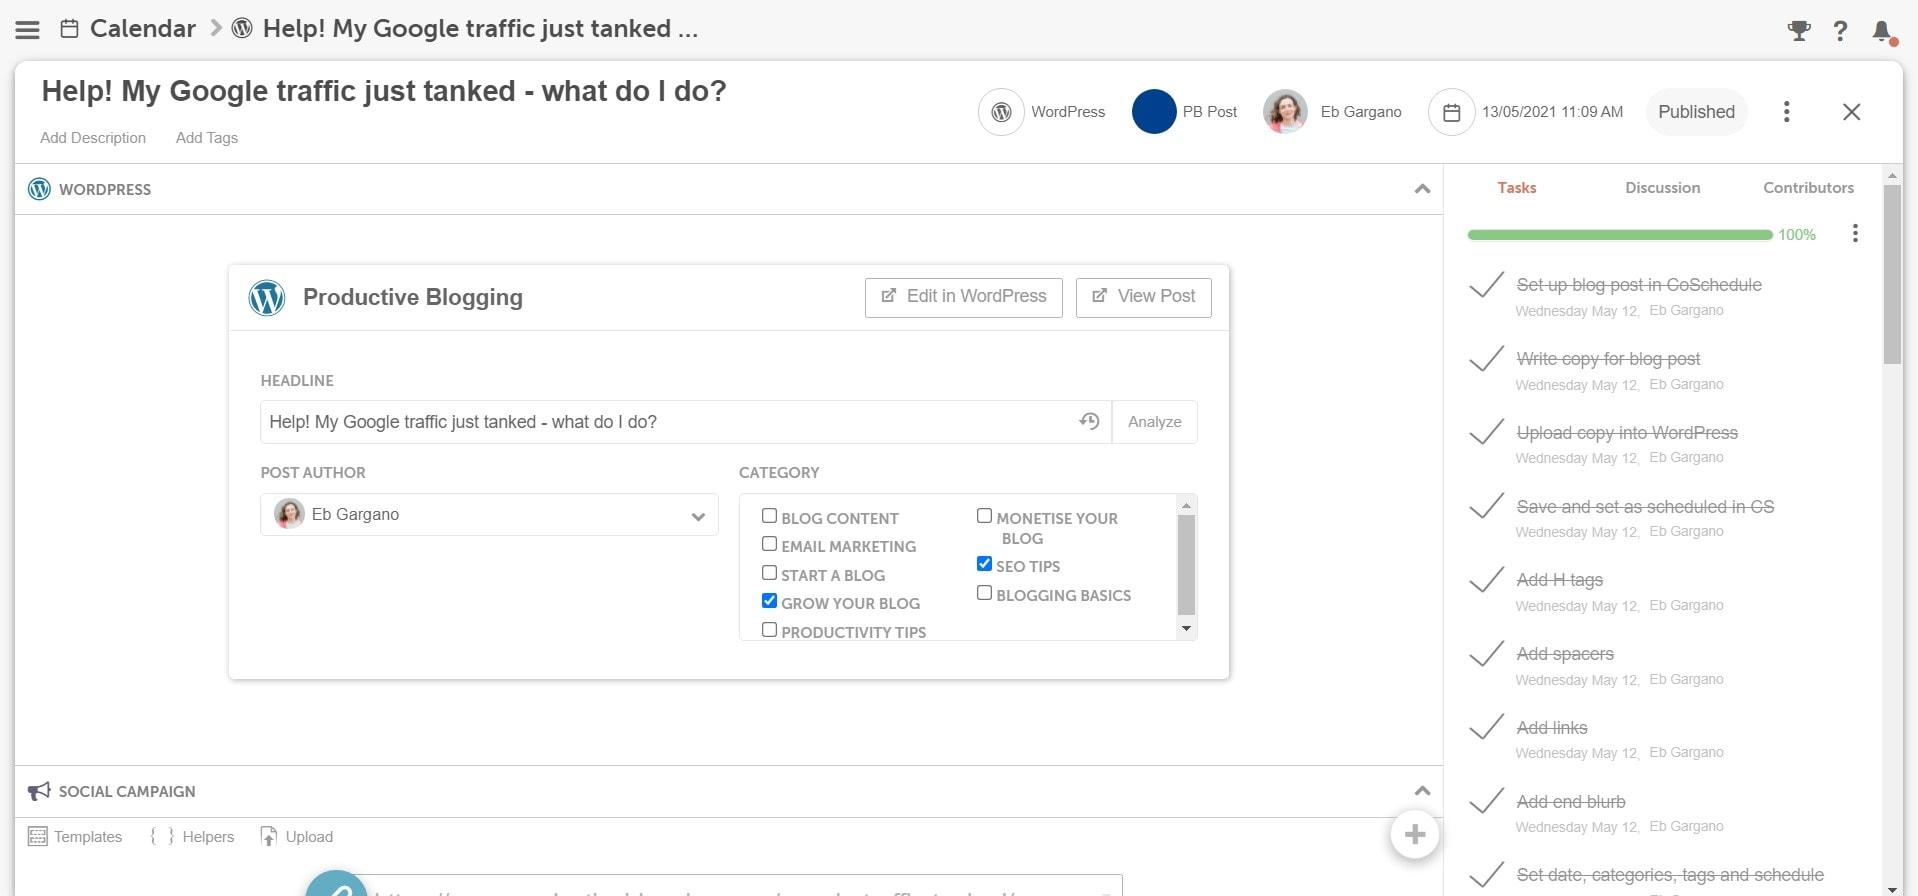 Screengrab of task template showing regular blogging tasks